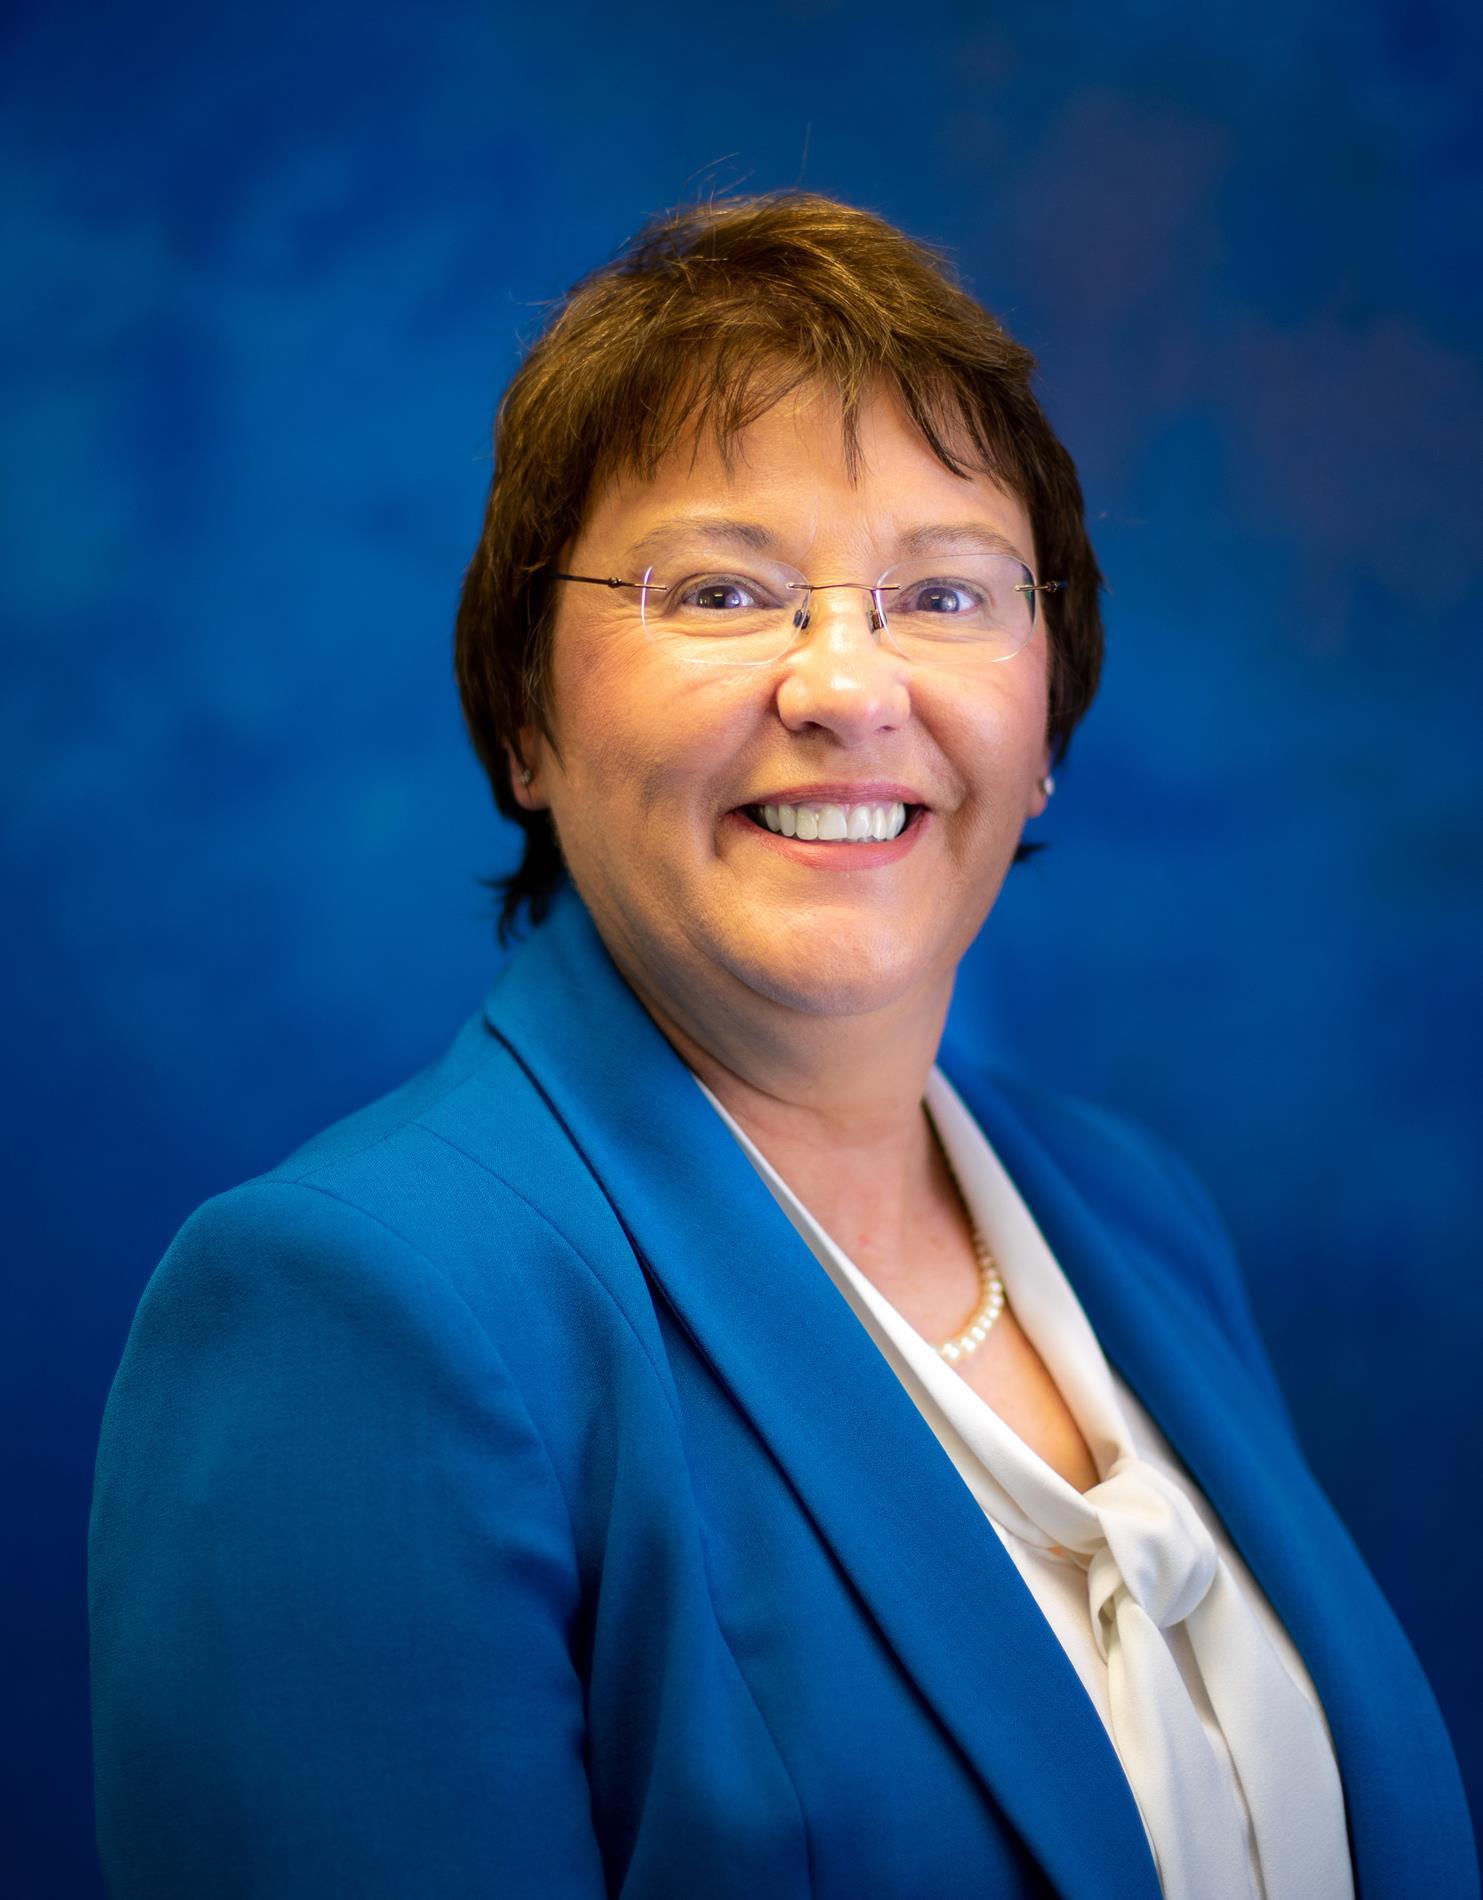 Dr. Reba Bailey Director of Federal Programs